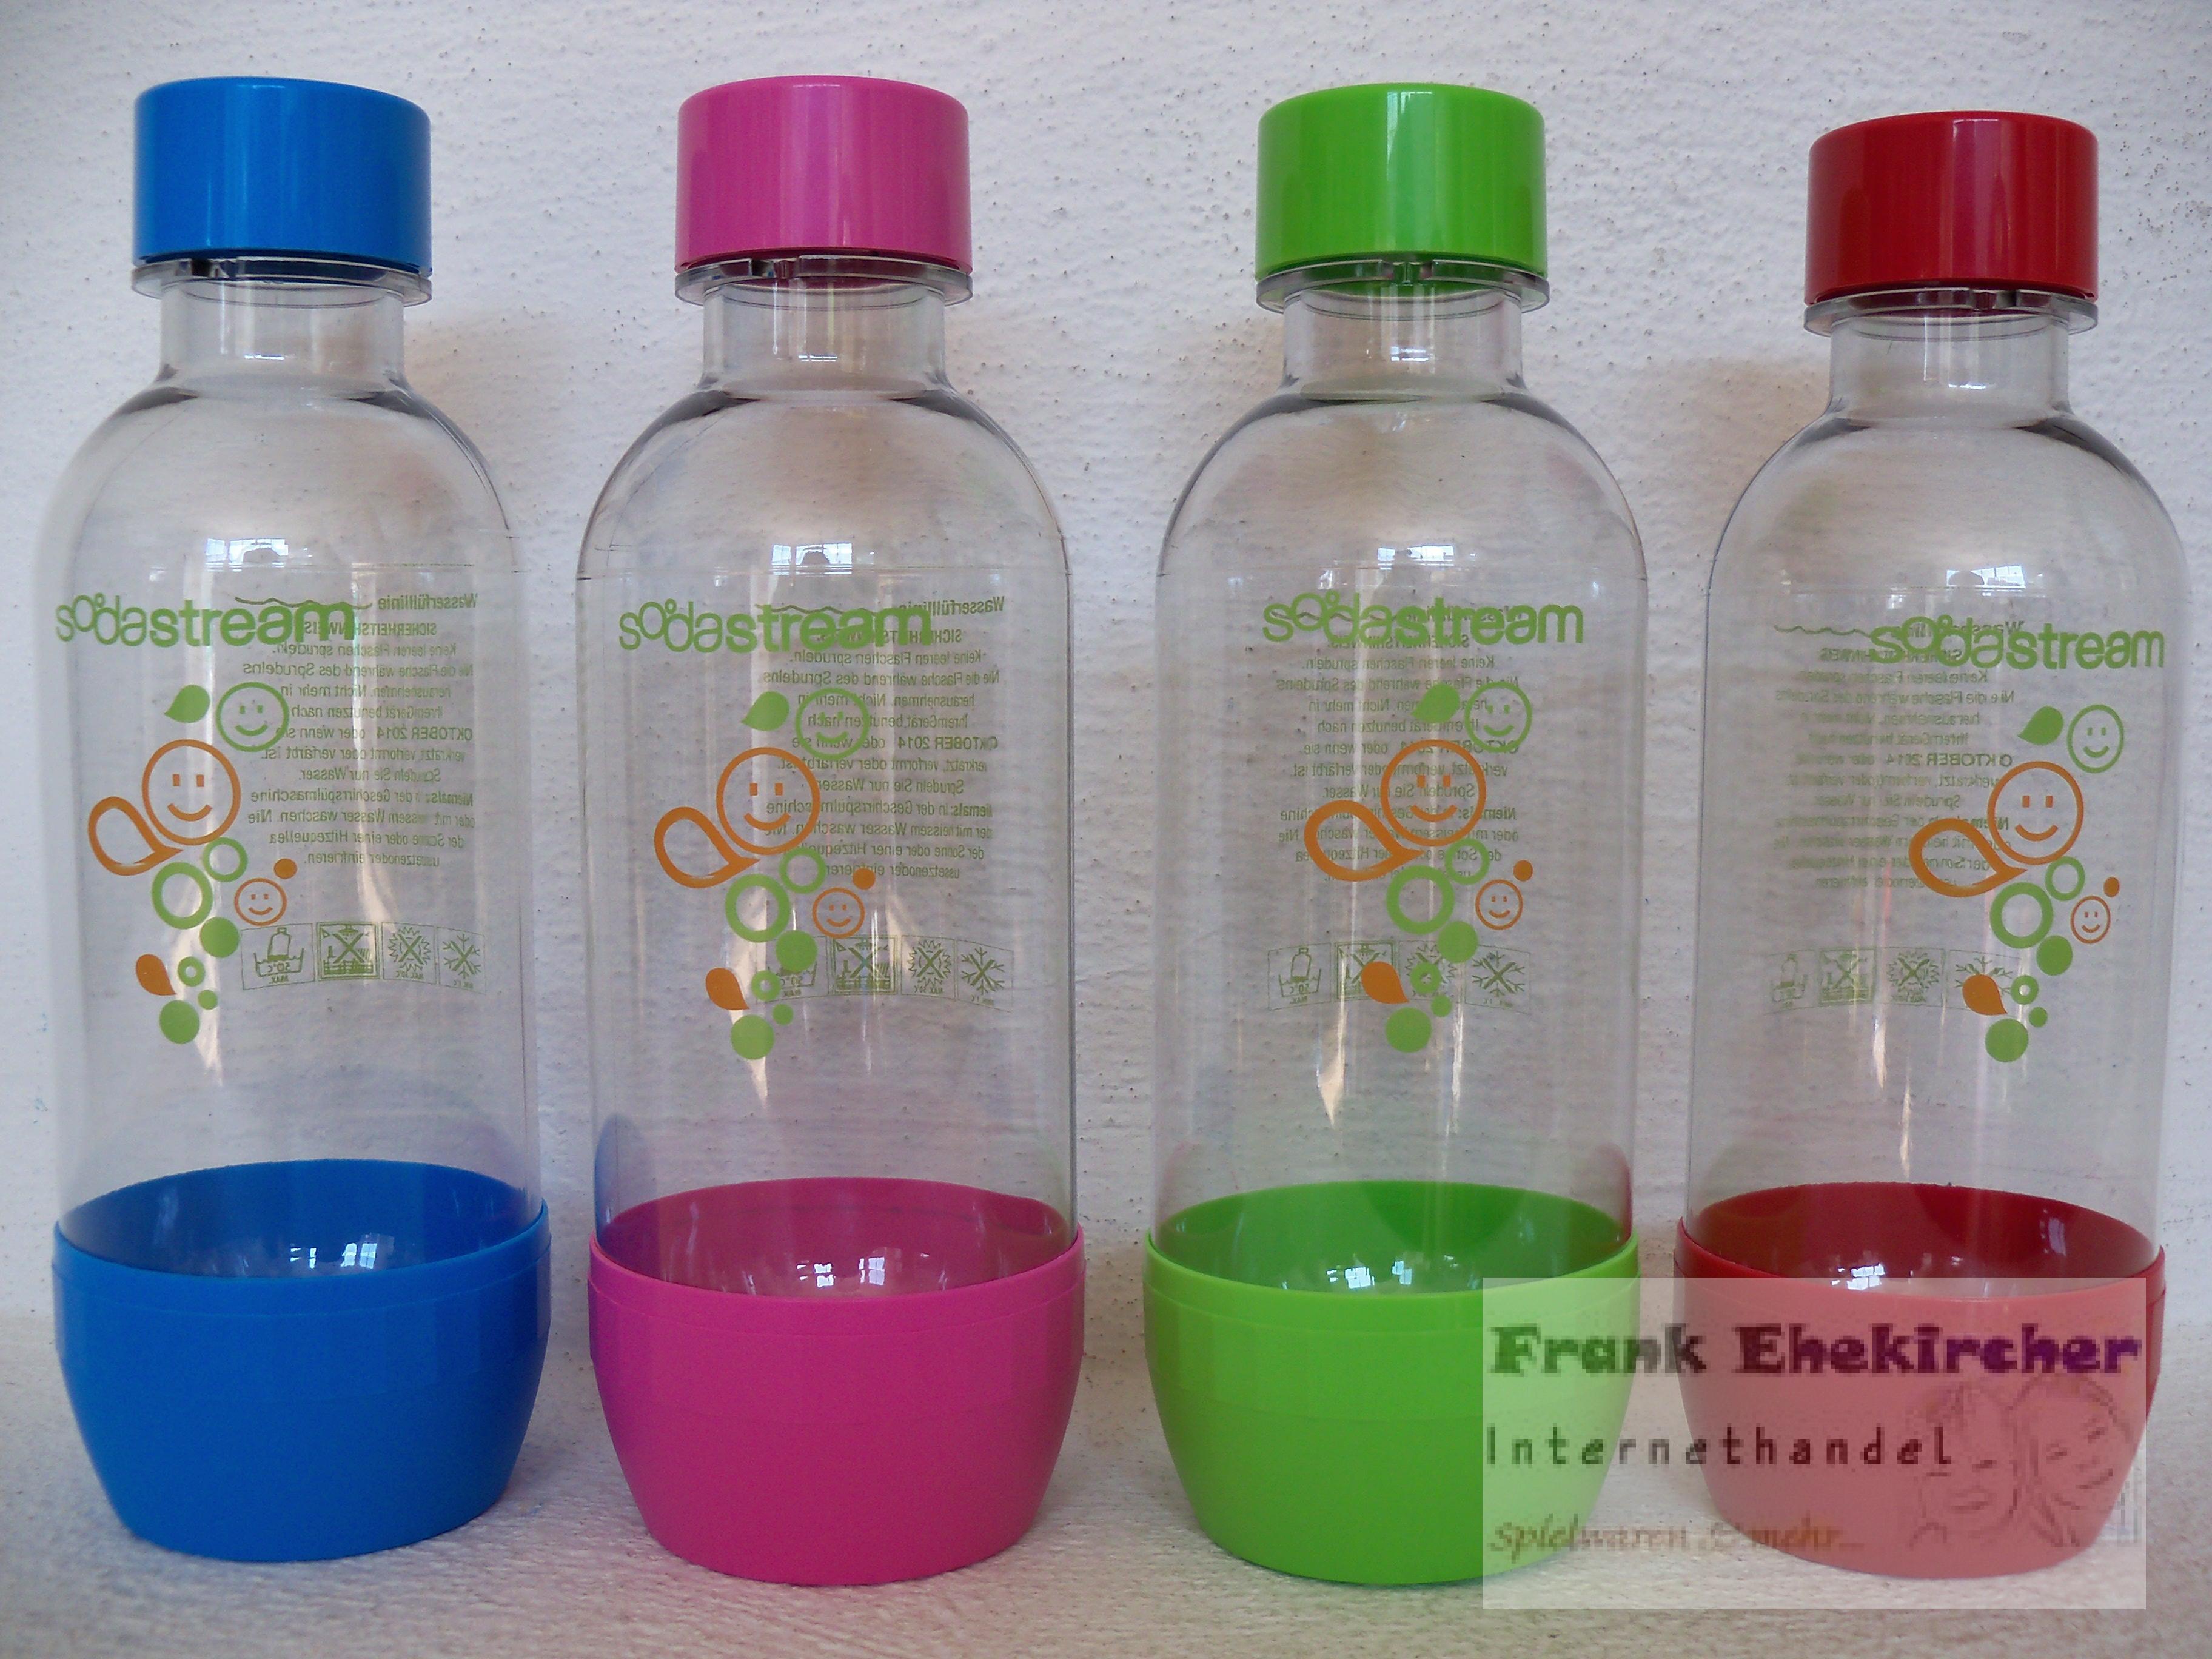 sodastream pet flasche 0 5l farbe w hlbar neu ovp soda stream ebay. Black Bedroom Furniture Sets. Home Design Ideas